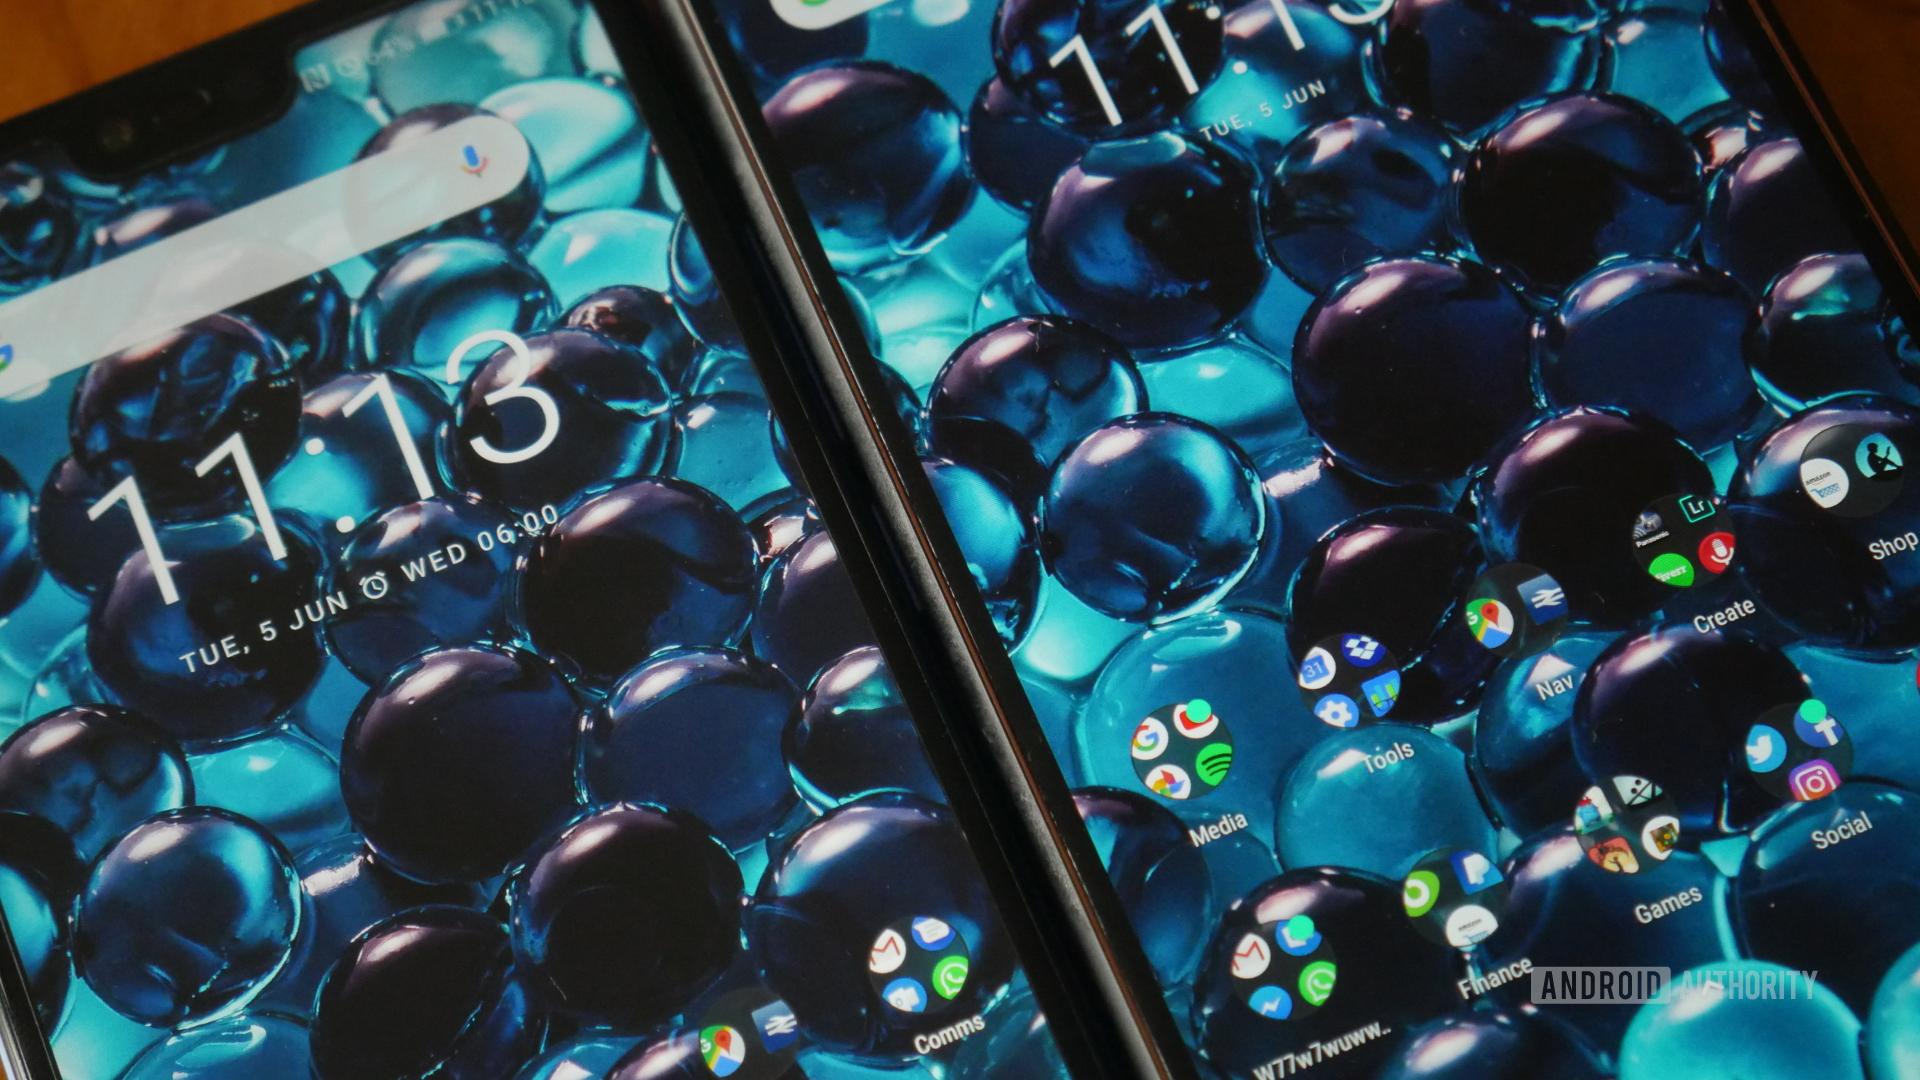 Honor 10 Nokia 7 Plus Screens